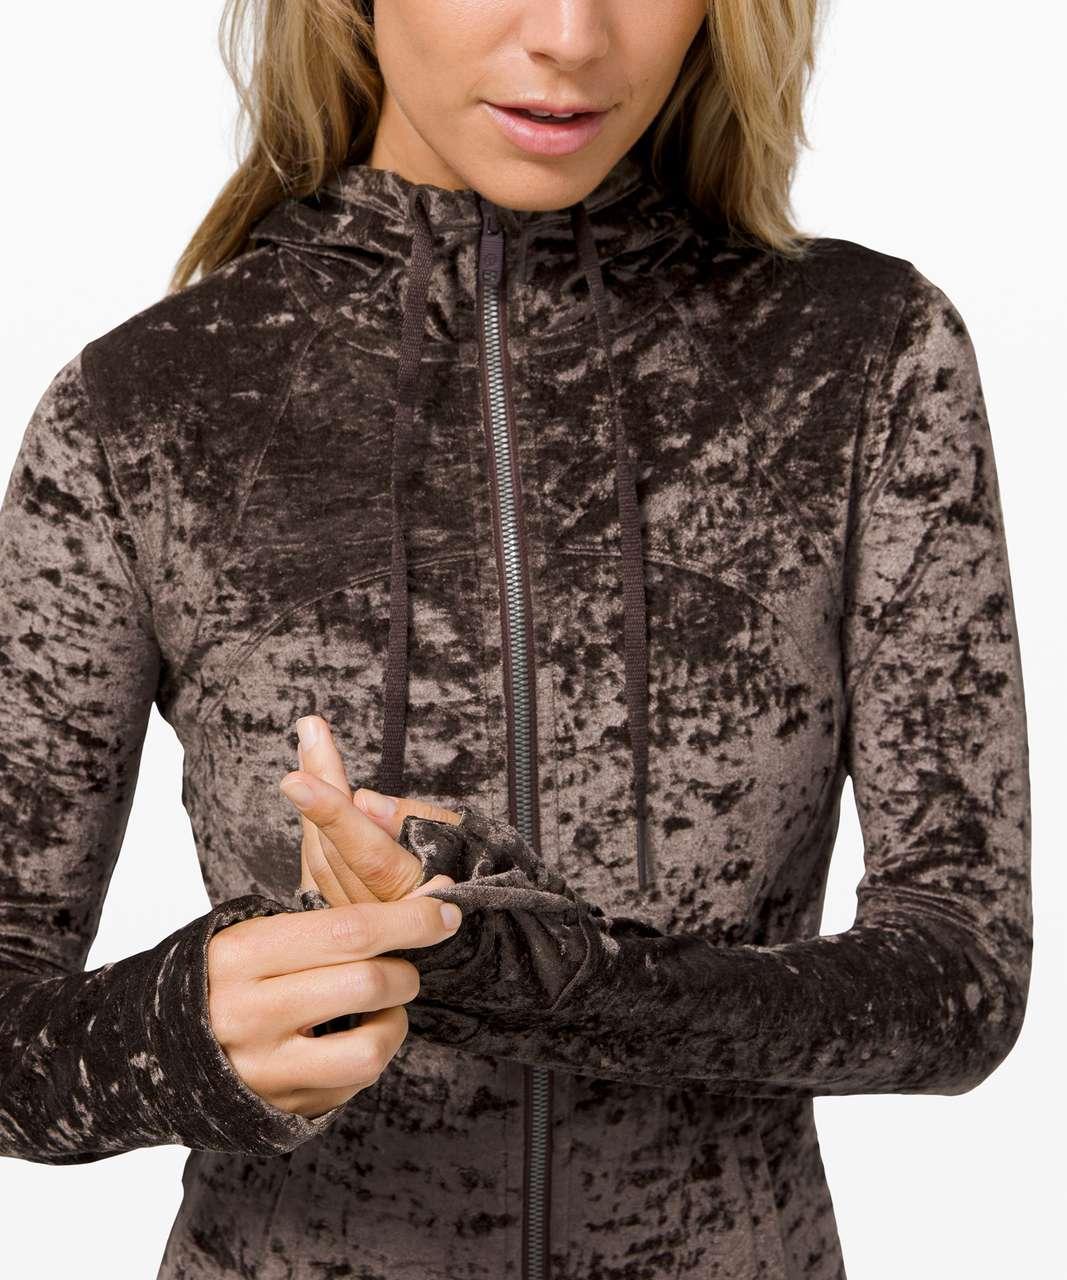 Lululemon Hooded Define Jacket *Crushed Velvet - French Press